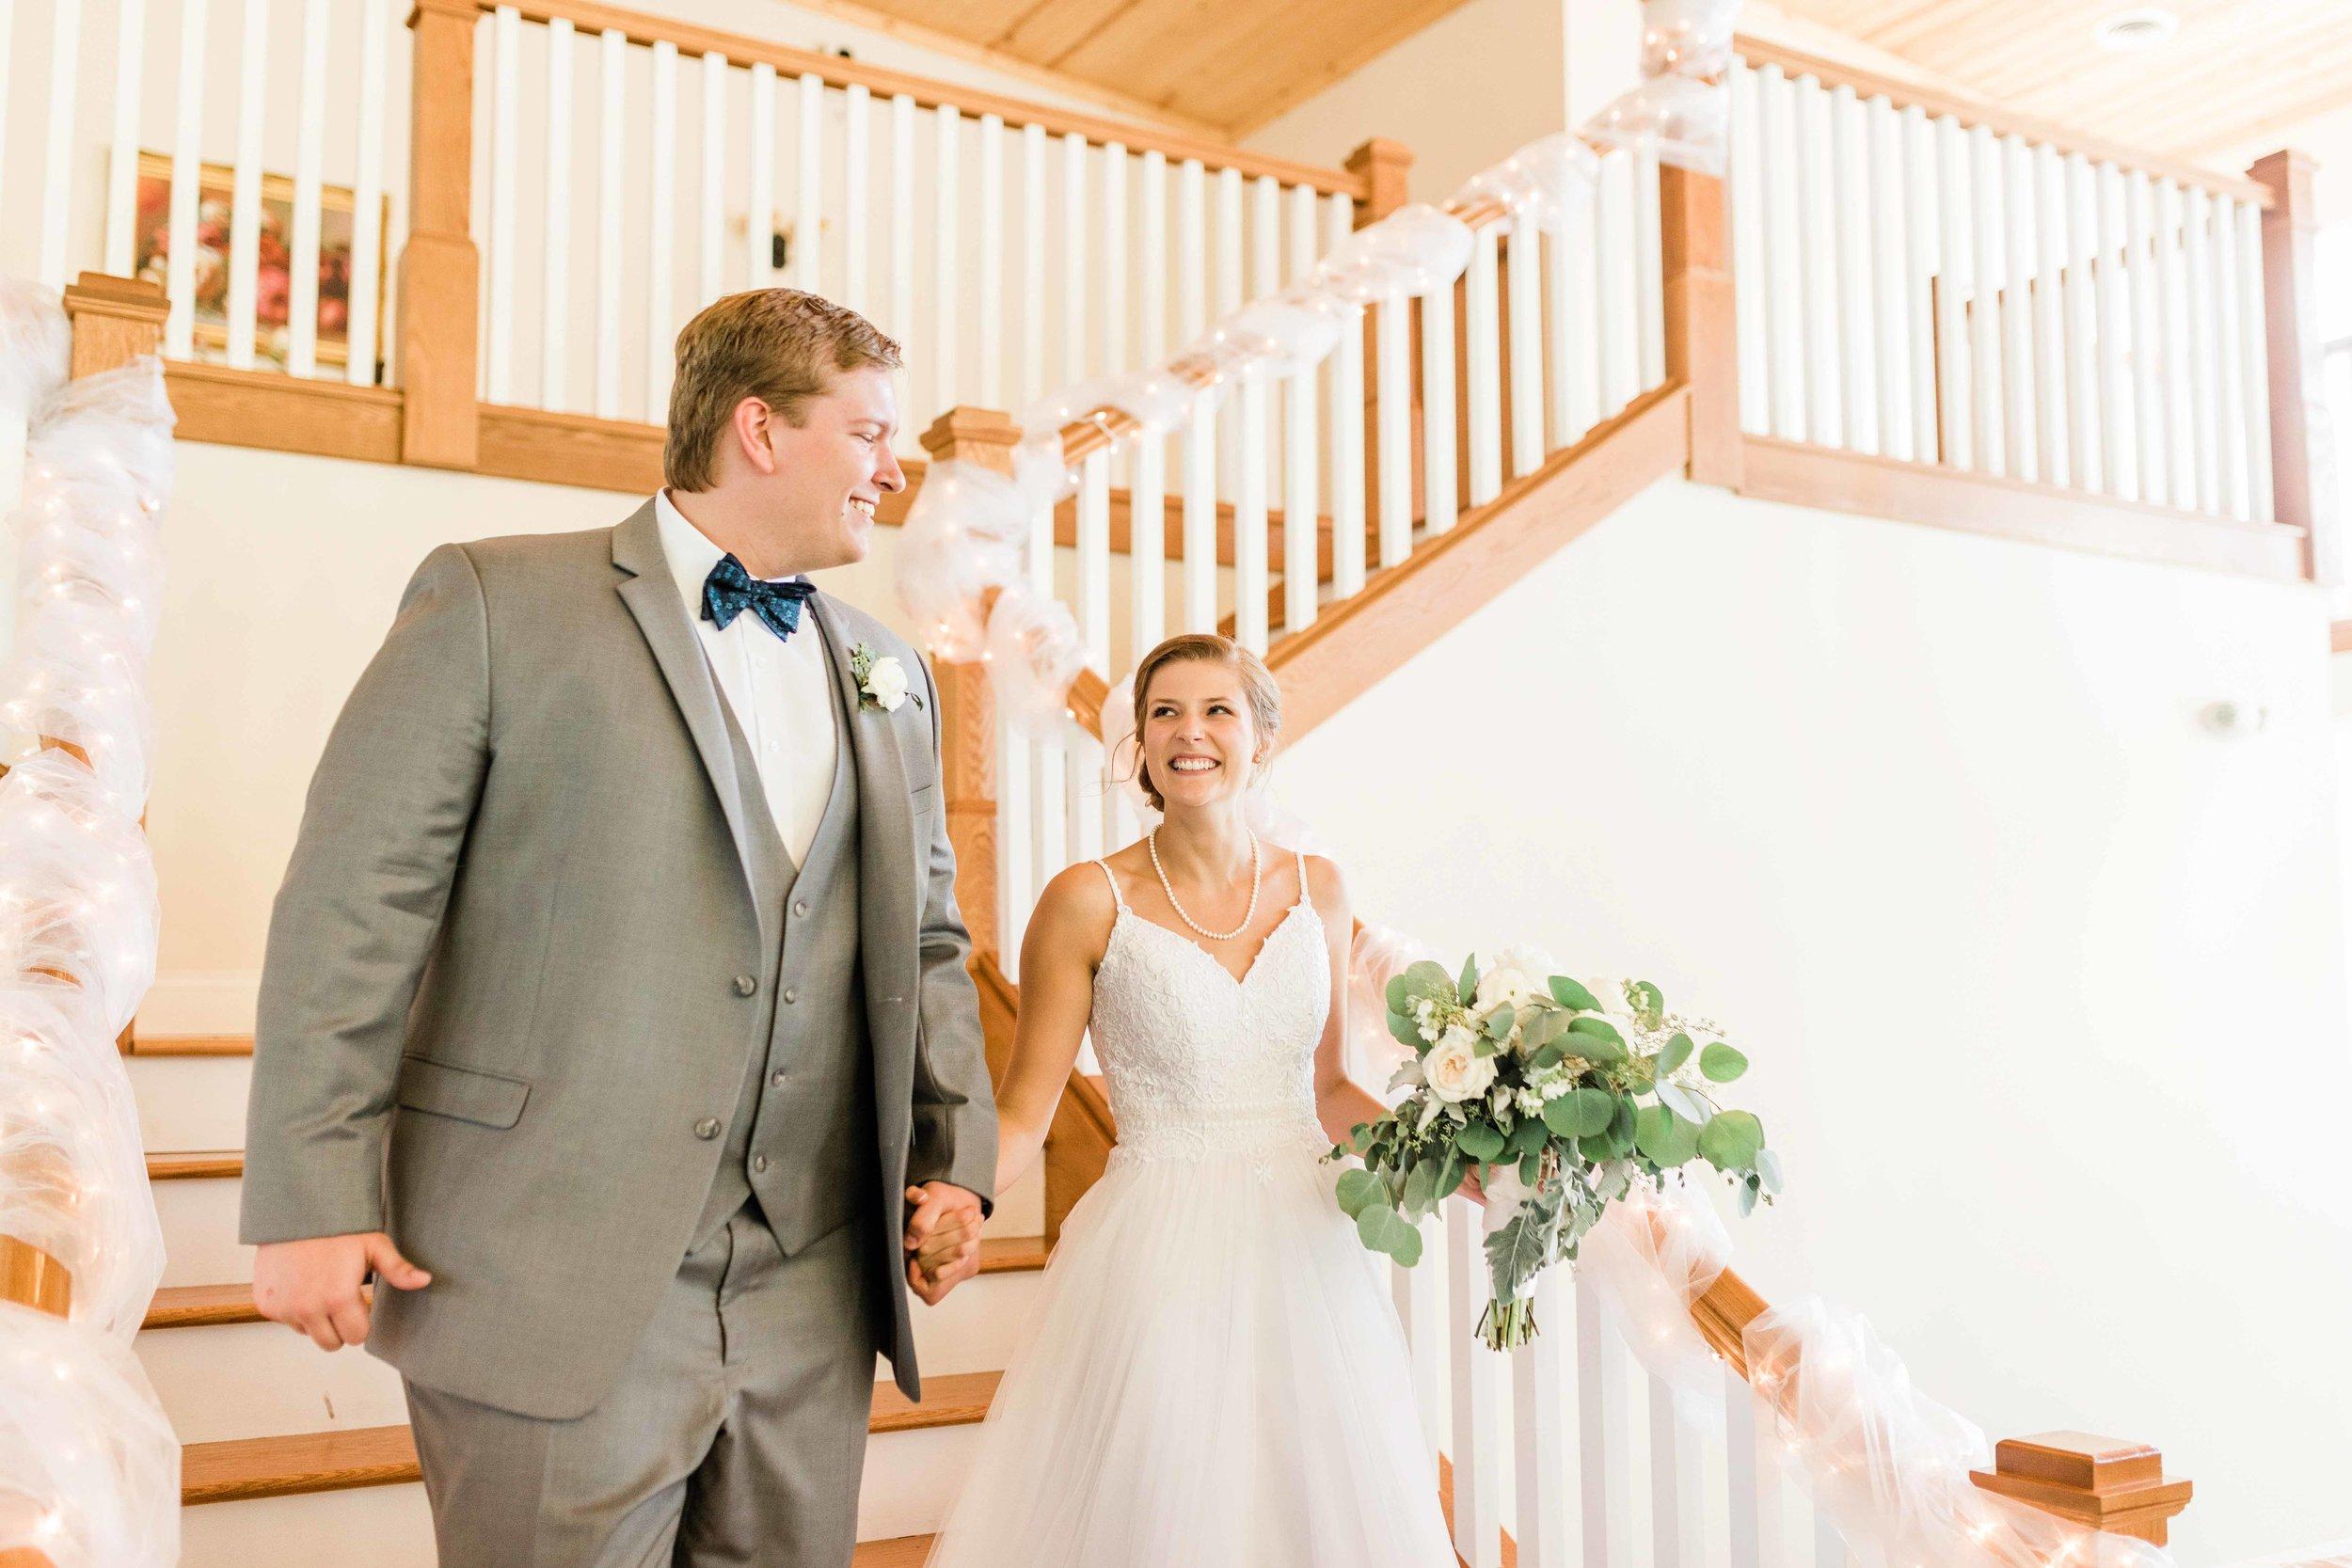 rosewood manor miamisburg wedding photos-1.jpg